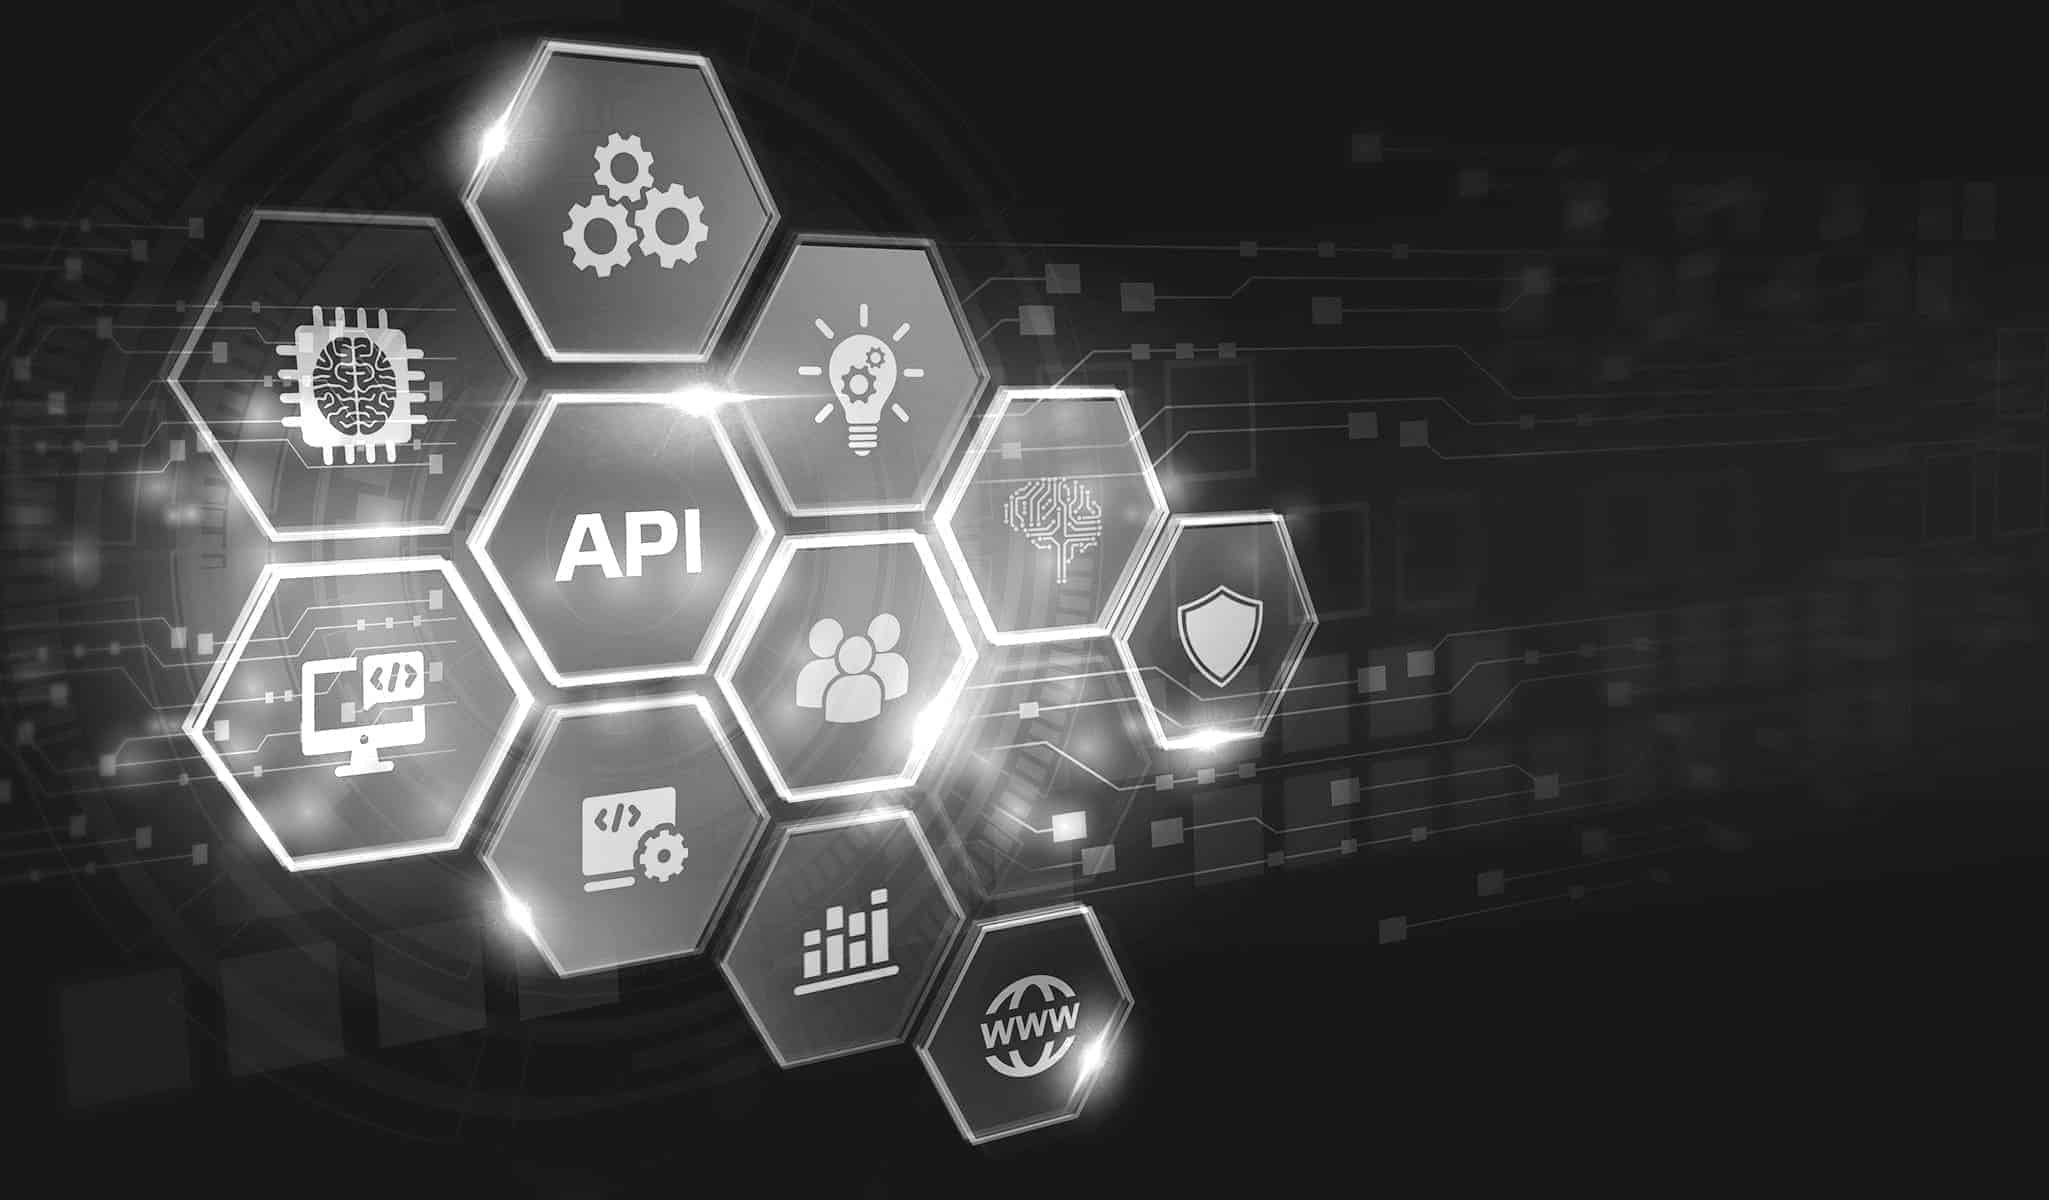 API Banking: How Do APIs Work?